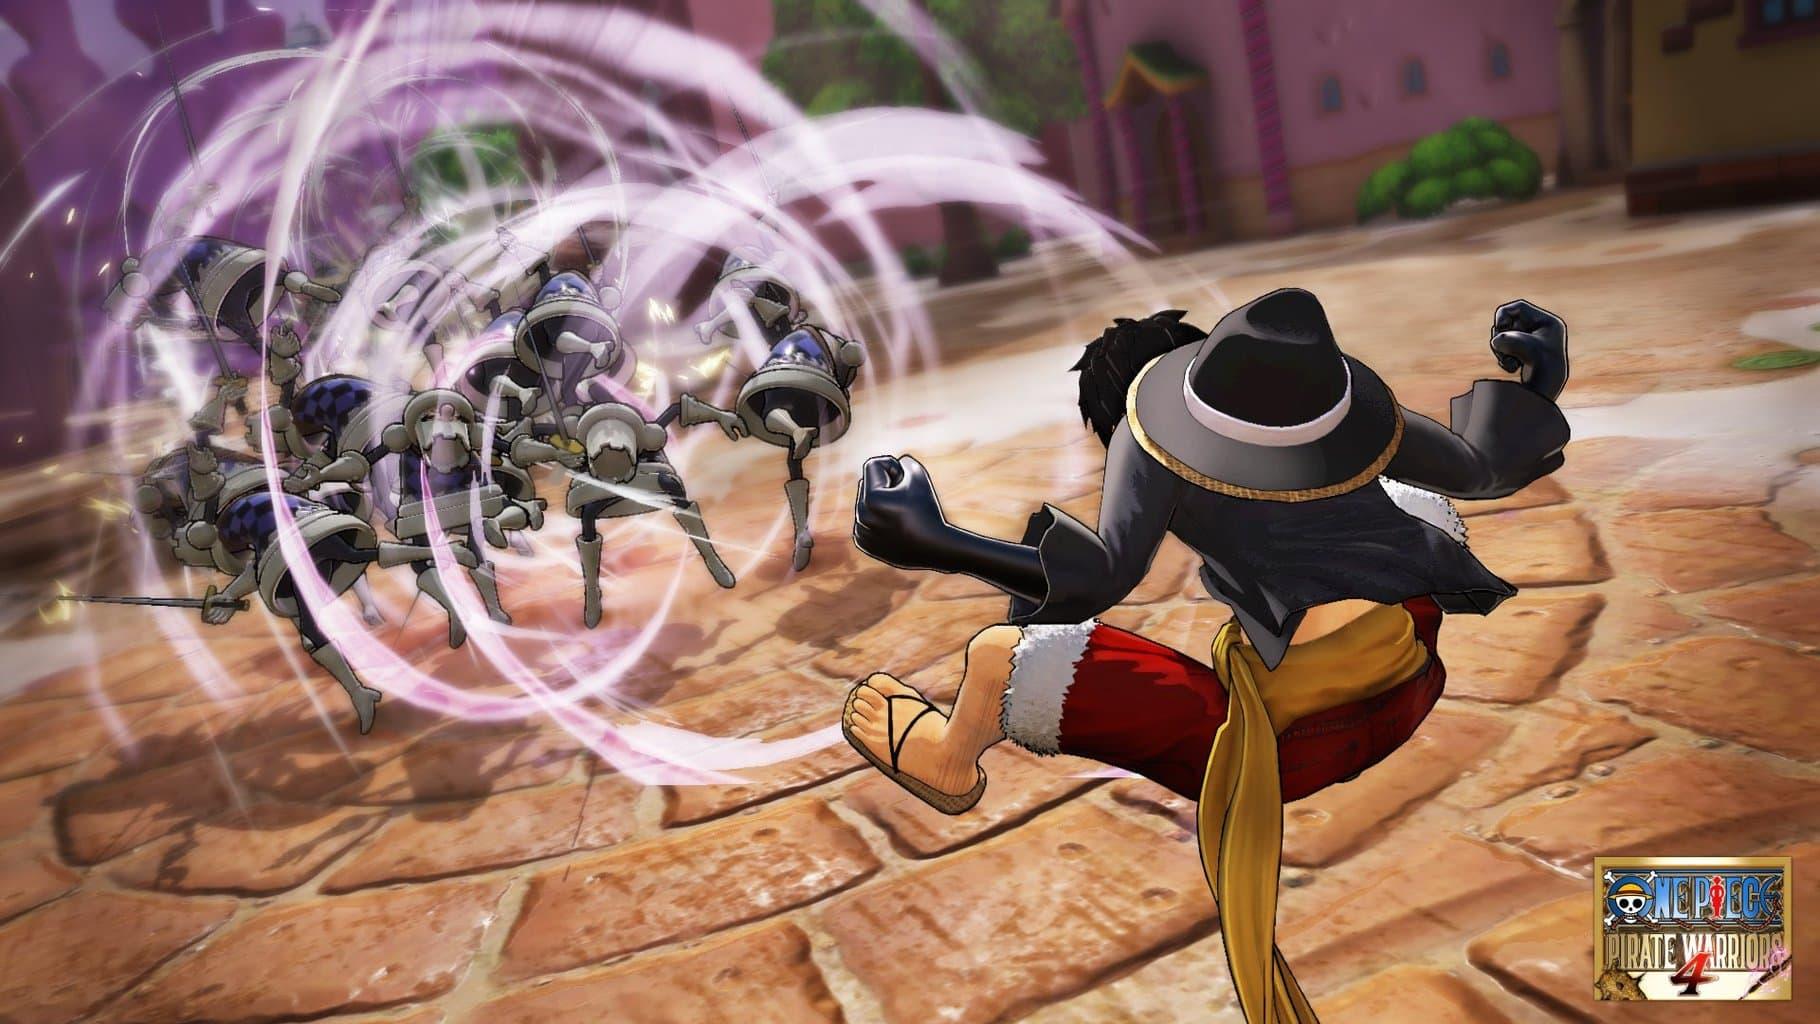 Photo of عرض جديد للعبة One Piece: Pirate Warriors يكشف عن شخصيات جديدة